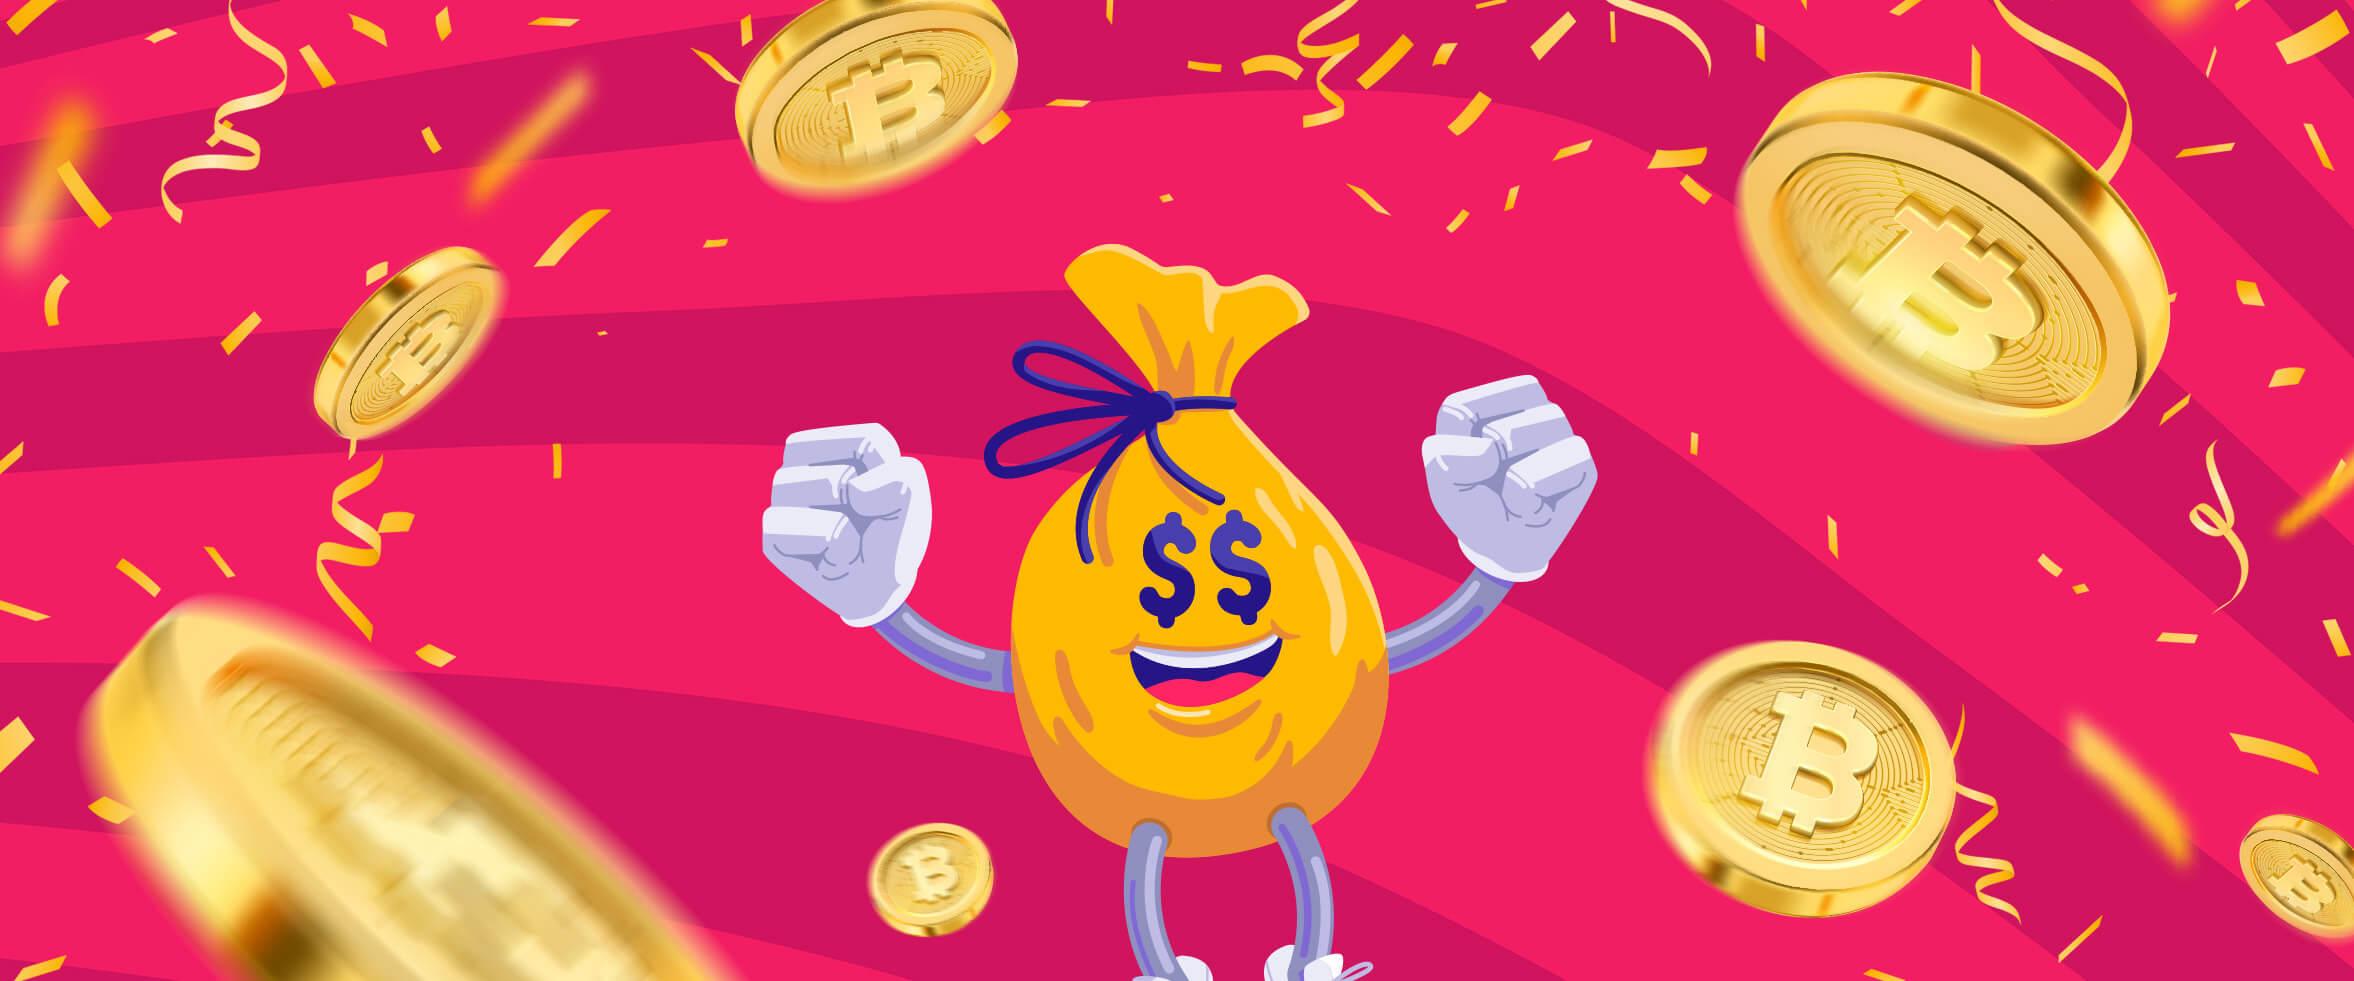 Join our 1-Year Bitcoin Birthday Bash